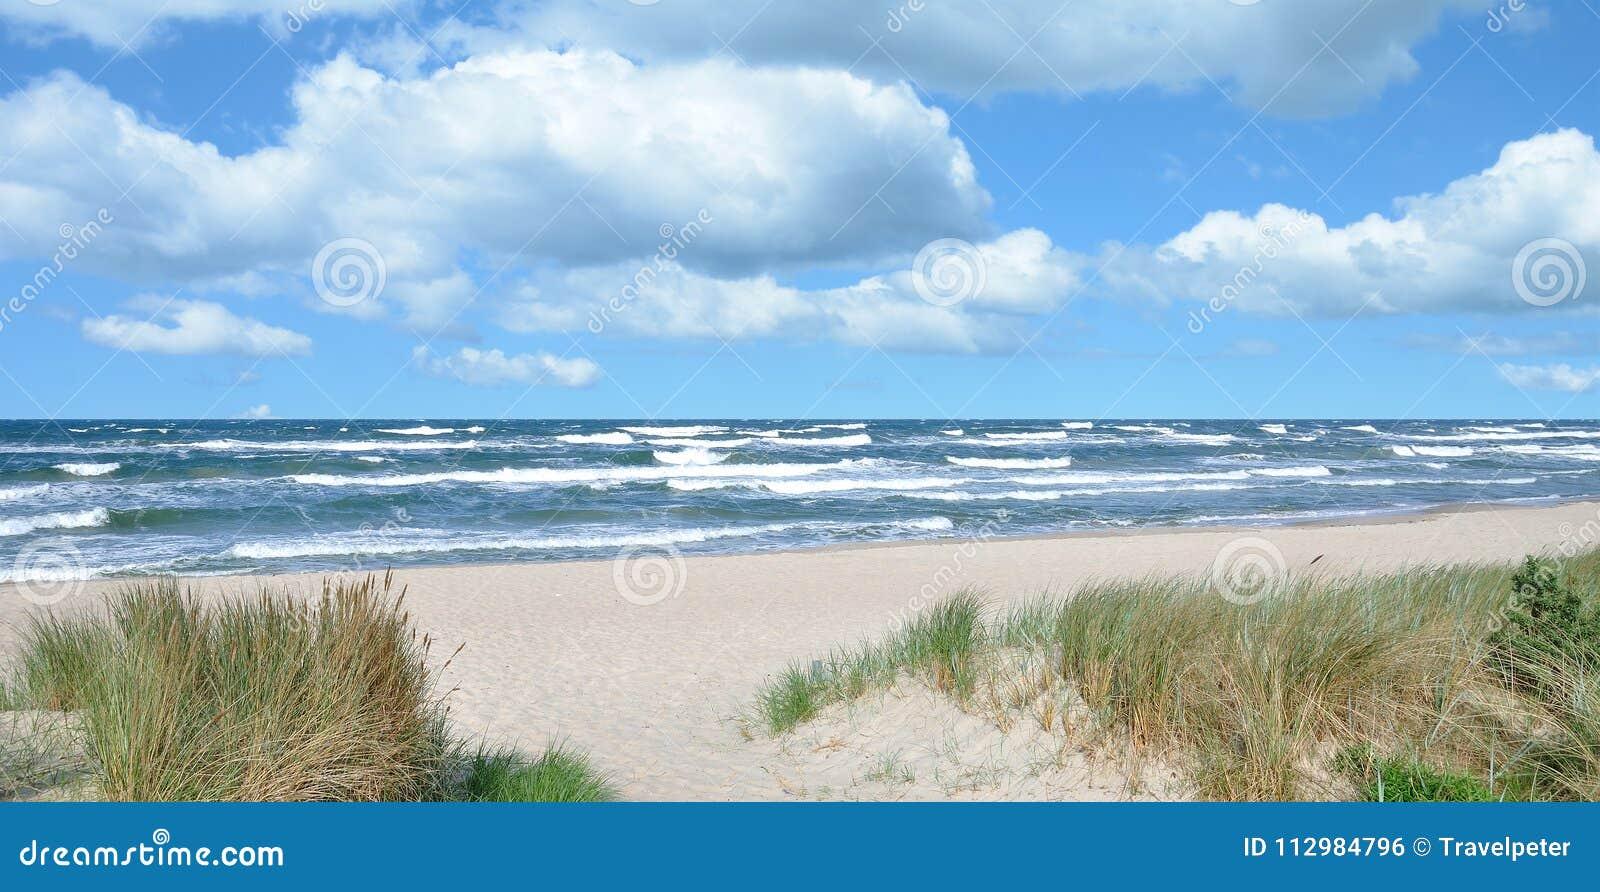 Stormy Day at Beach of Baabe,Ruegen,Germany